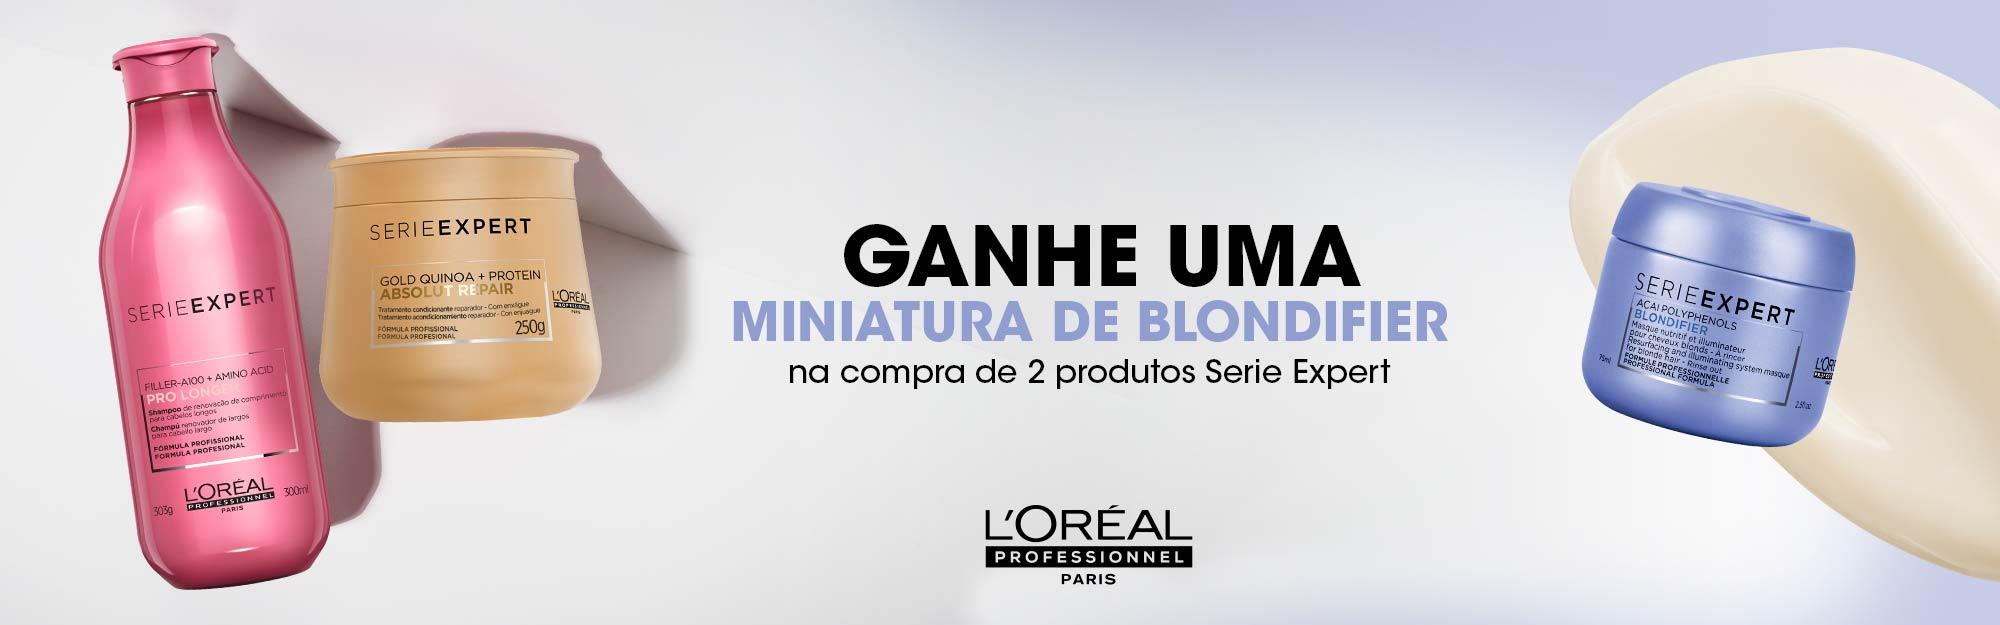 LP | Mini Blondifier